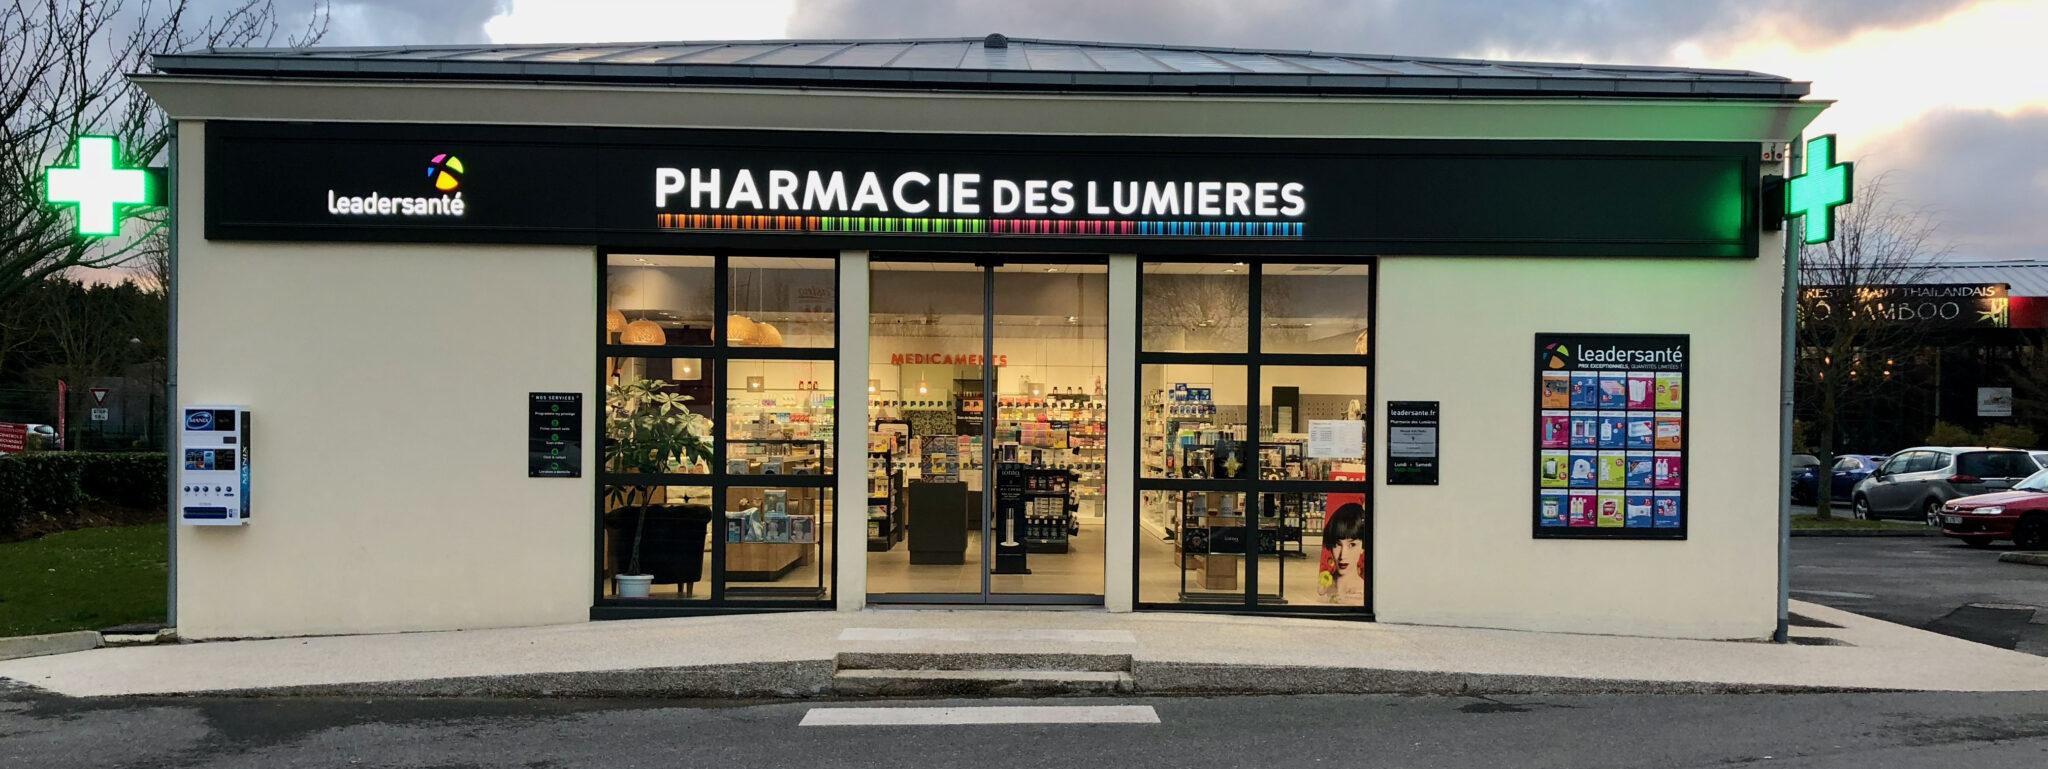 PHARMACIE DES LUMIERES – 77164